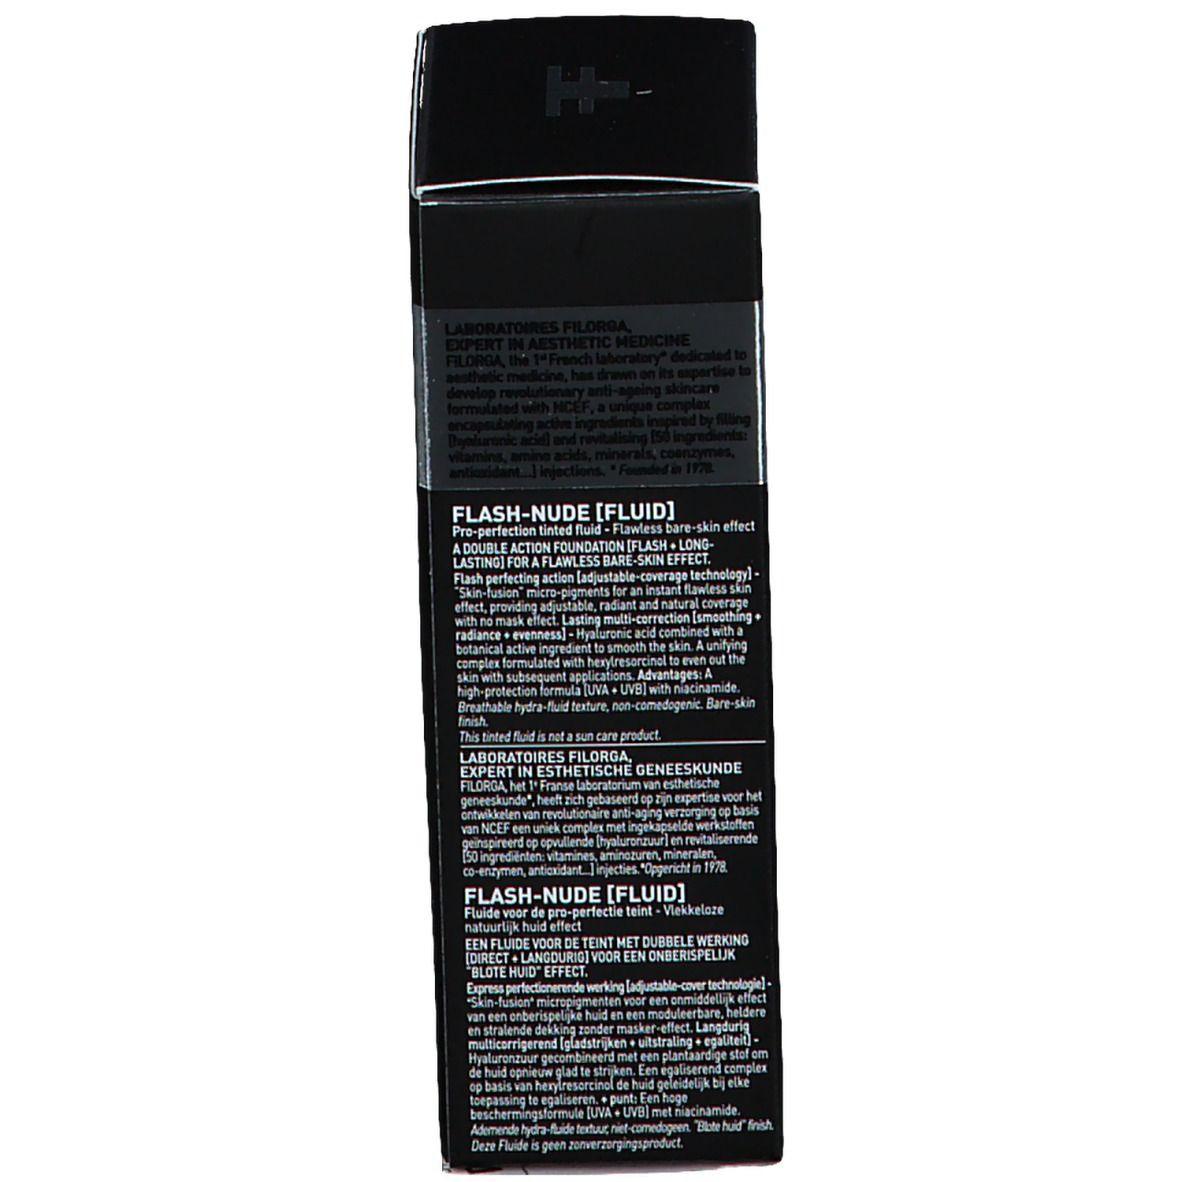 FILORGA Flash-Nude Fluid 03 Amber SPF30 - shop-farmacia.it